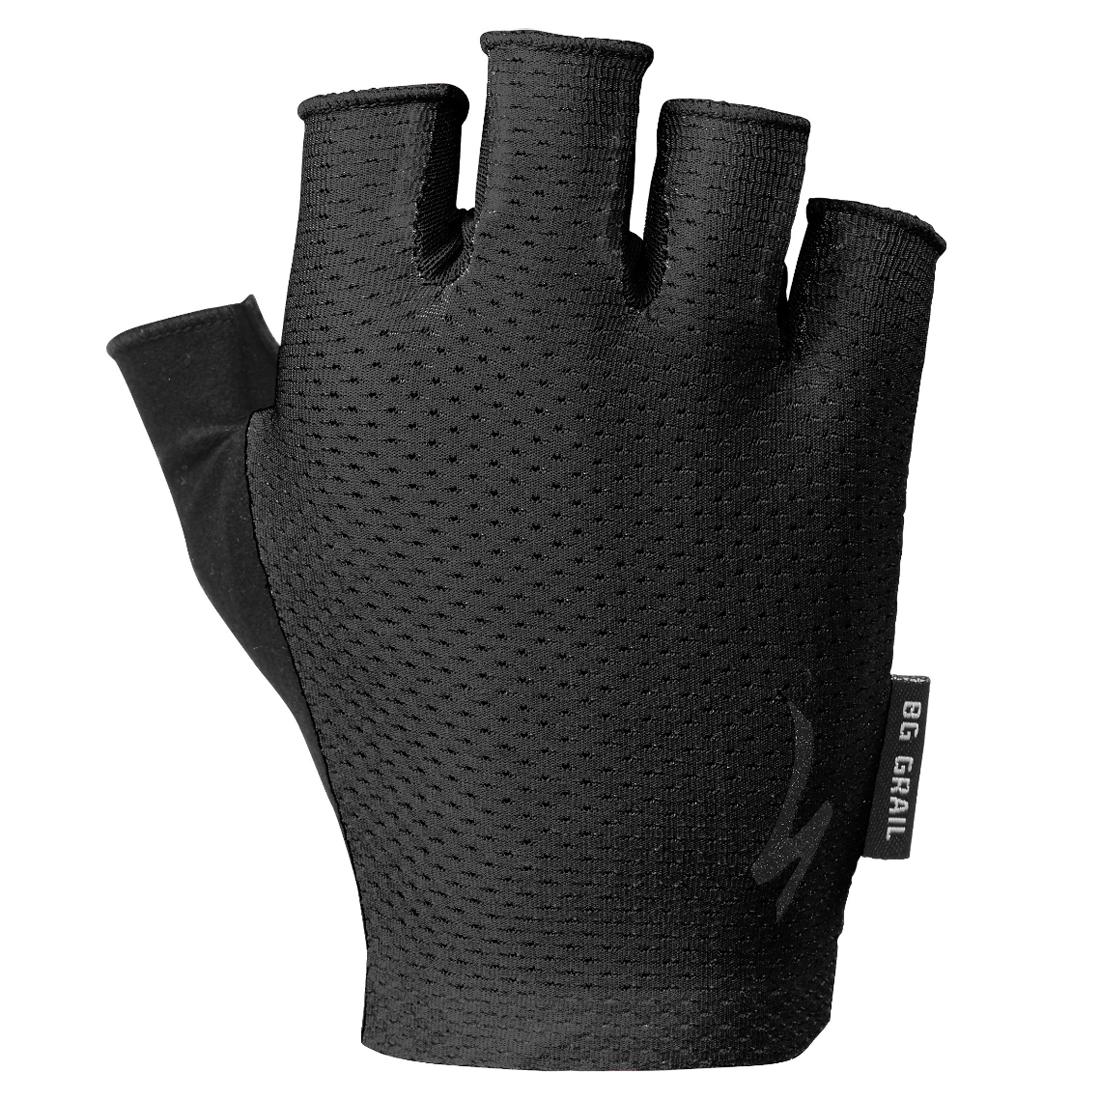 Specialized Body Geometry Grail SF Women's Short Finger Gloves - Black